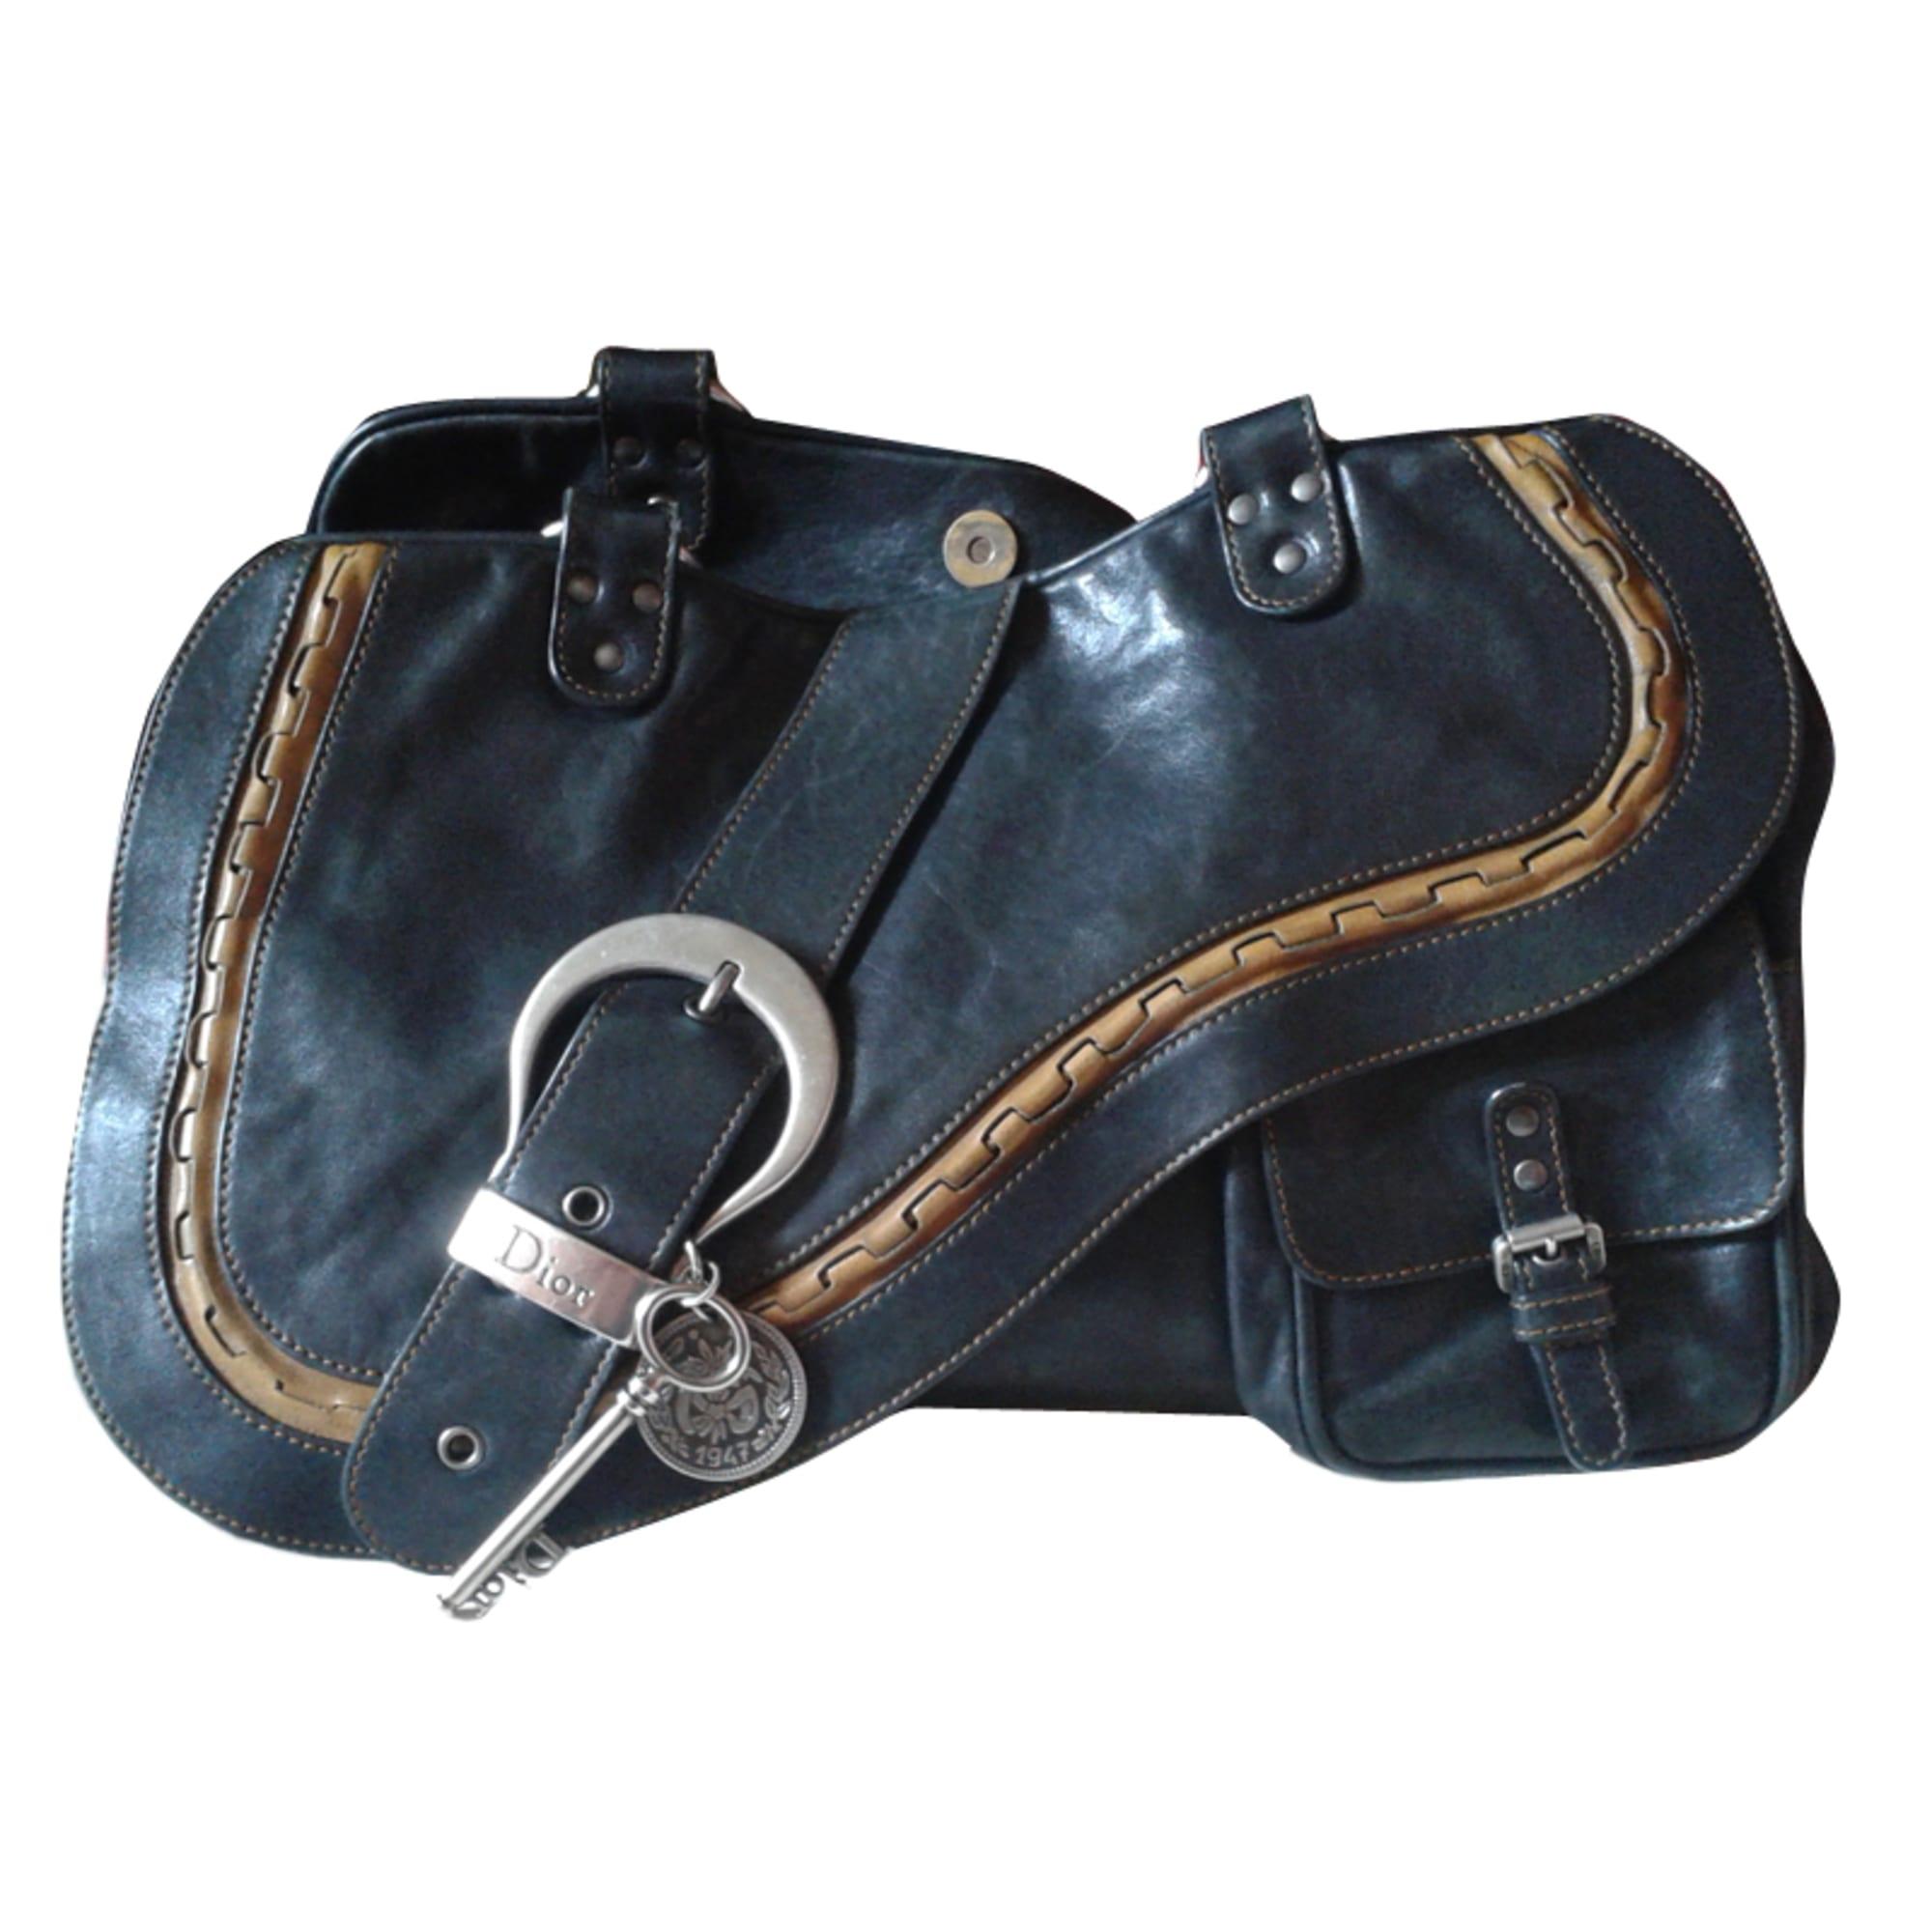 727ea24b6a Sac à main en cuir DIOR gaucho noir vendu par Léa569210 - 3669369